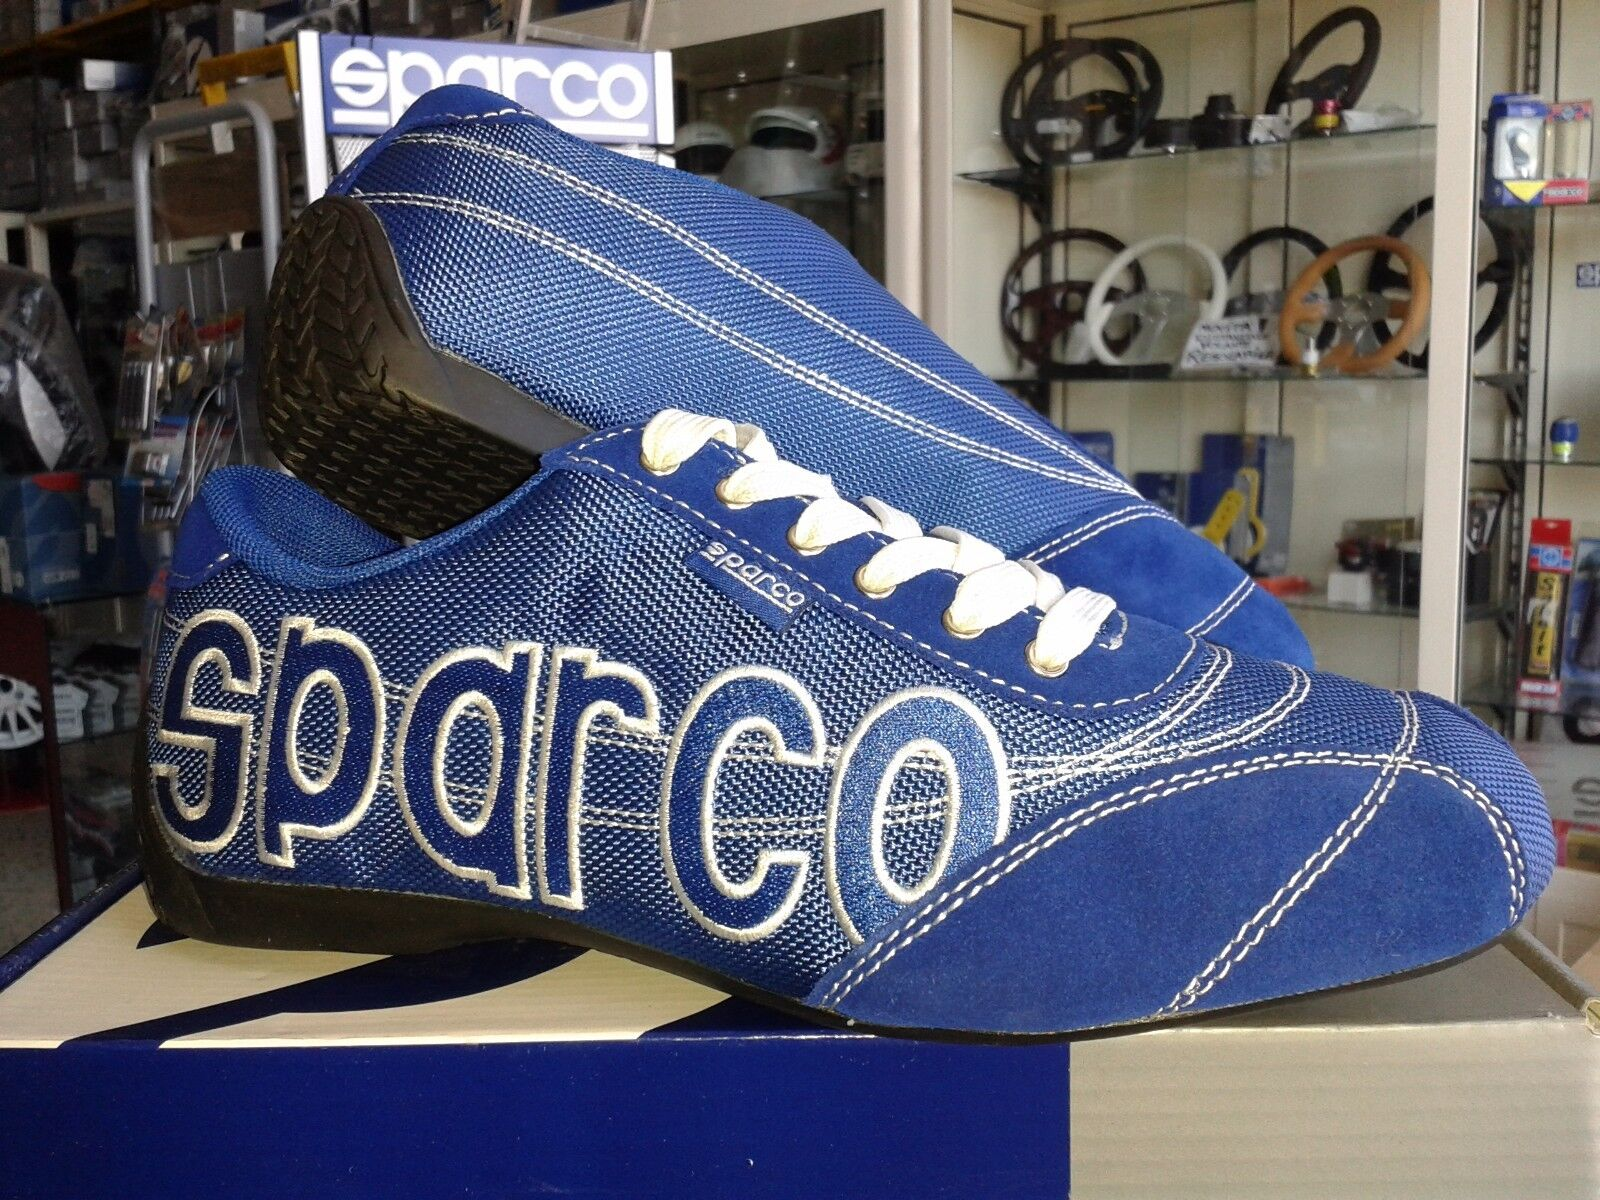 SPARCO FREETIME SCHUHE LOGO BLAU SPARCO SHOES 40 TEAMWEAR SNEAKERS SPORTIVE RACE